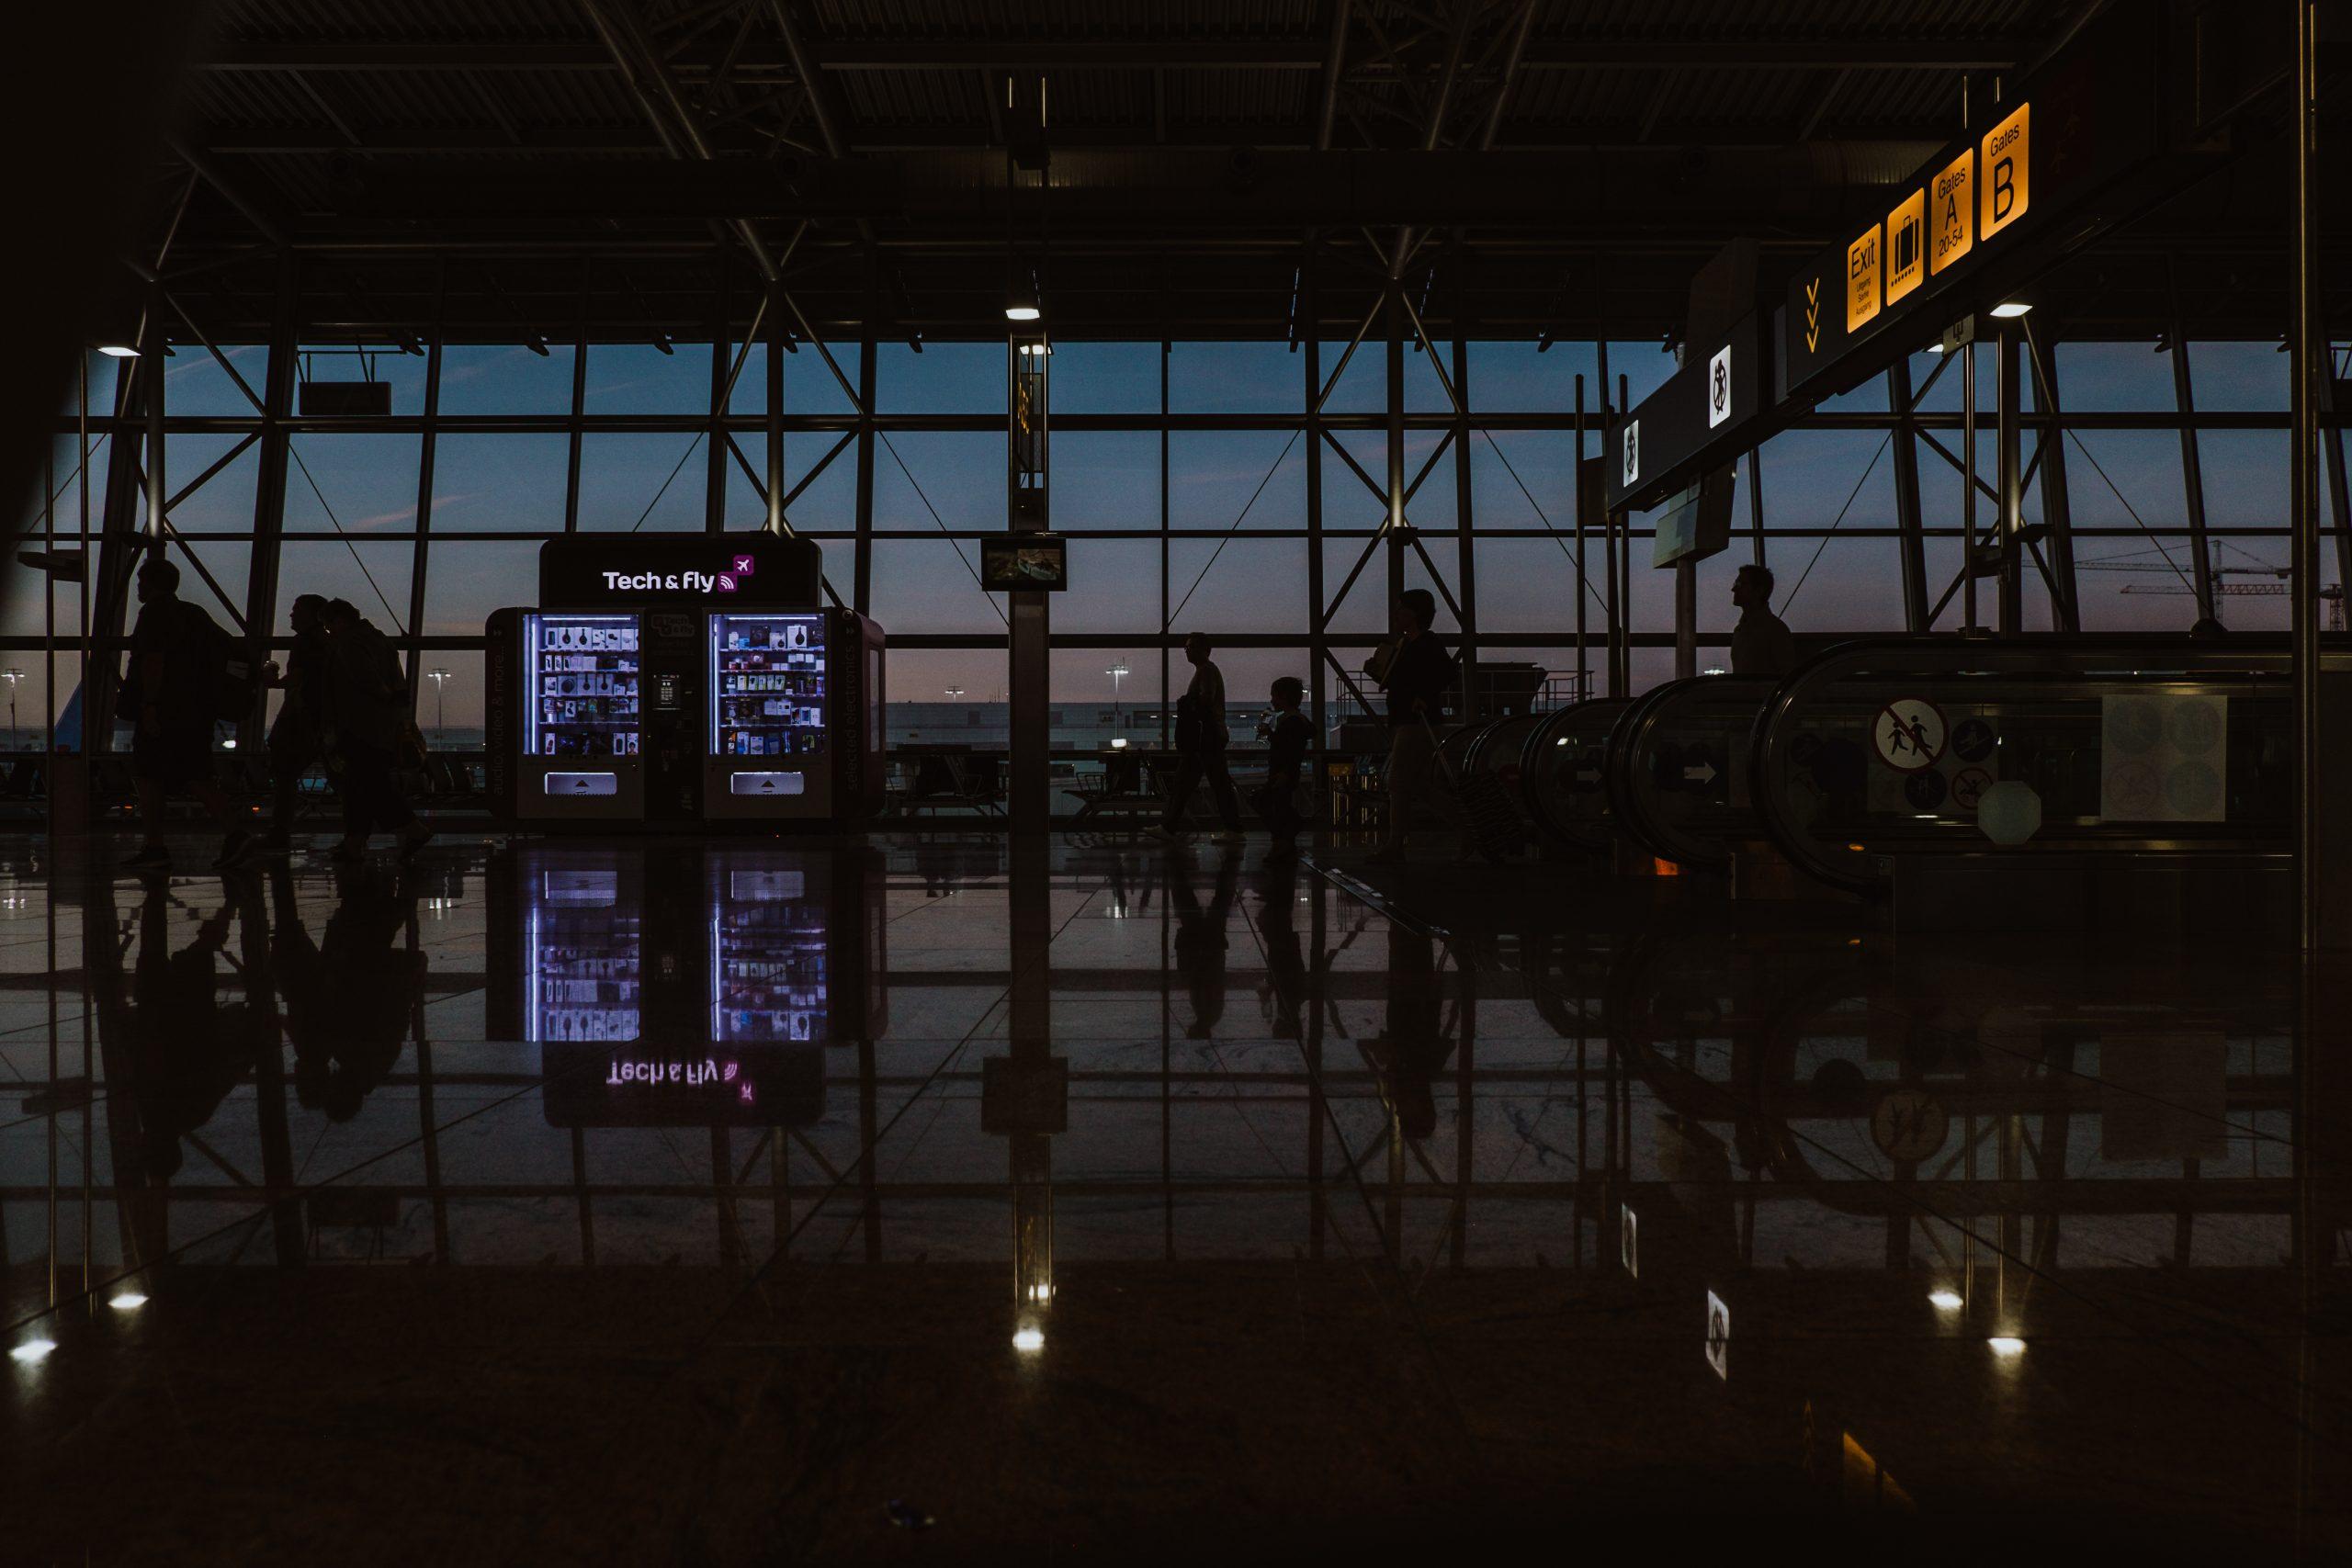 Gatwick airport at night